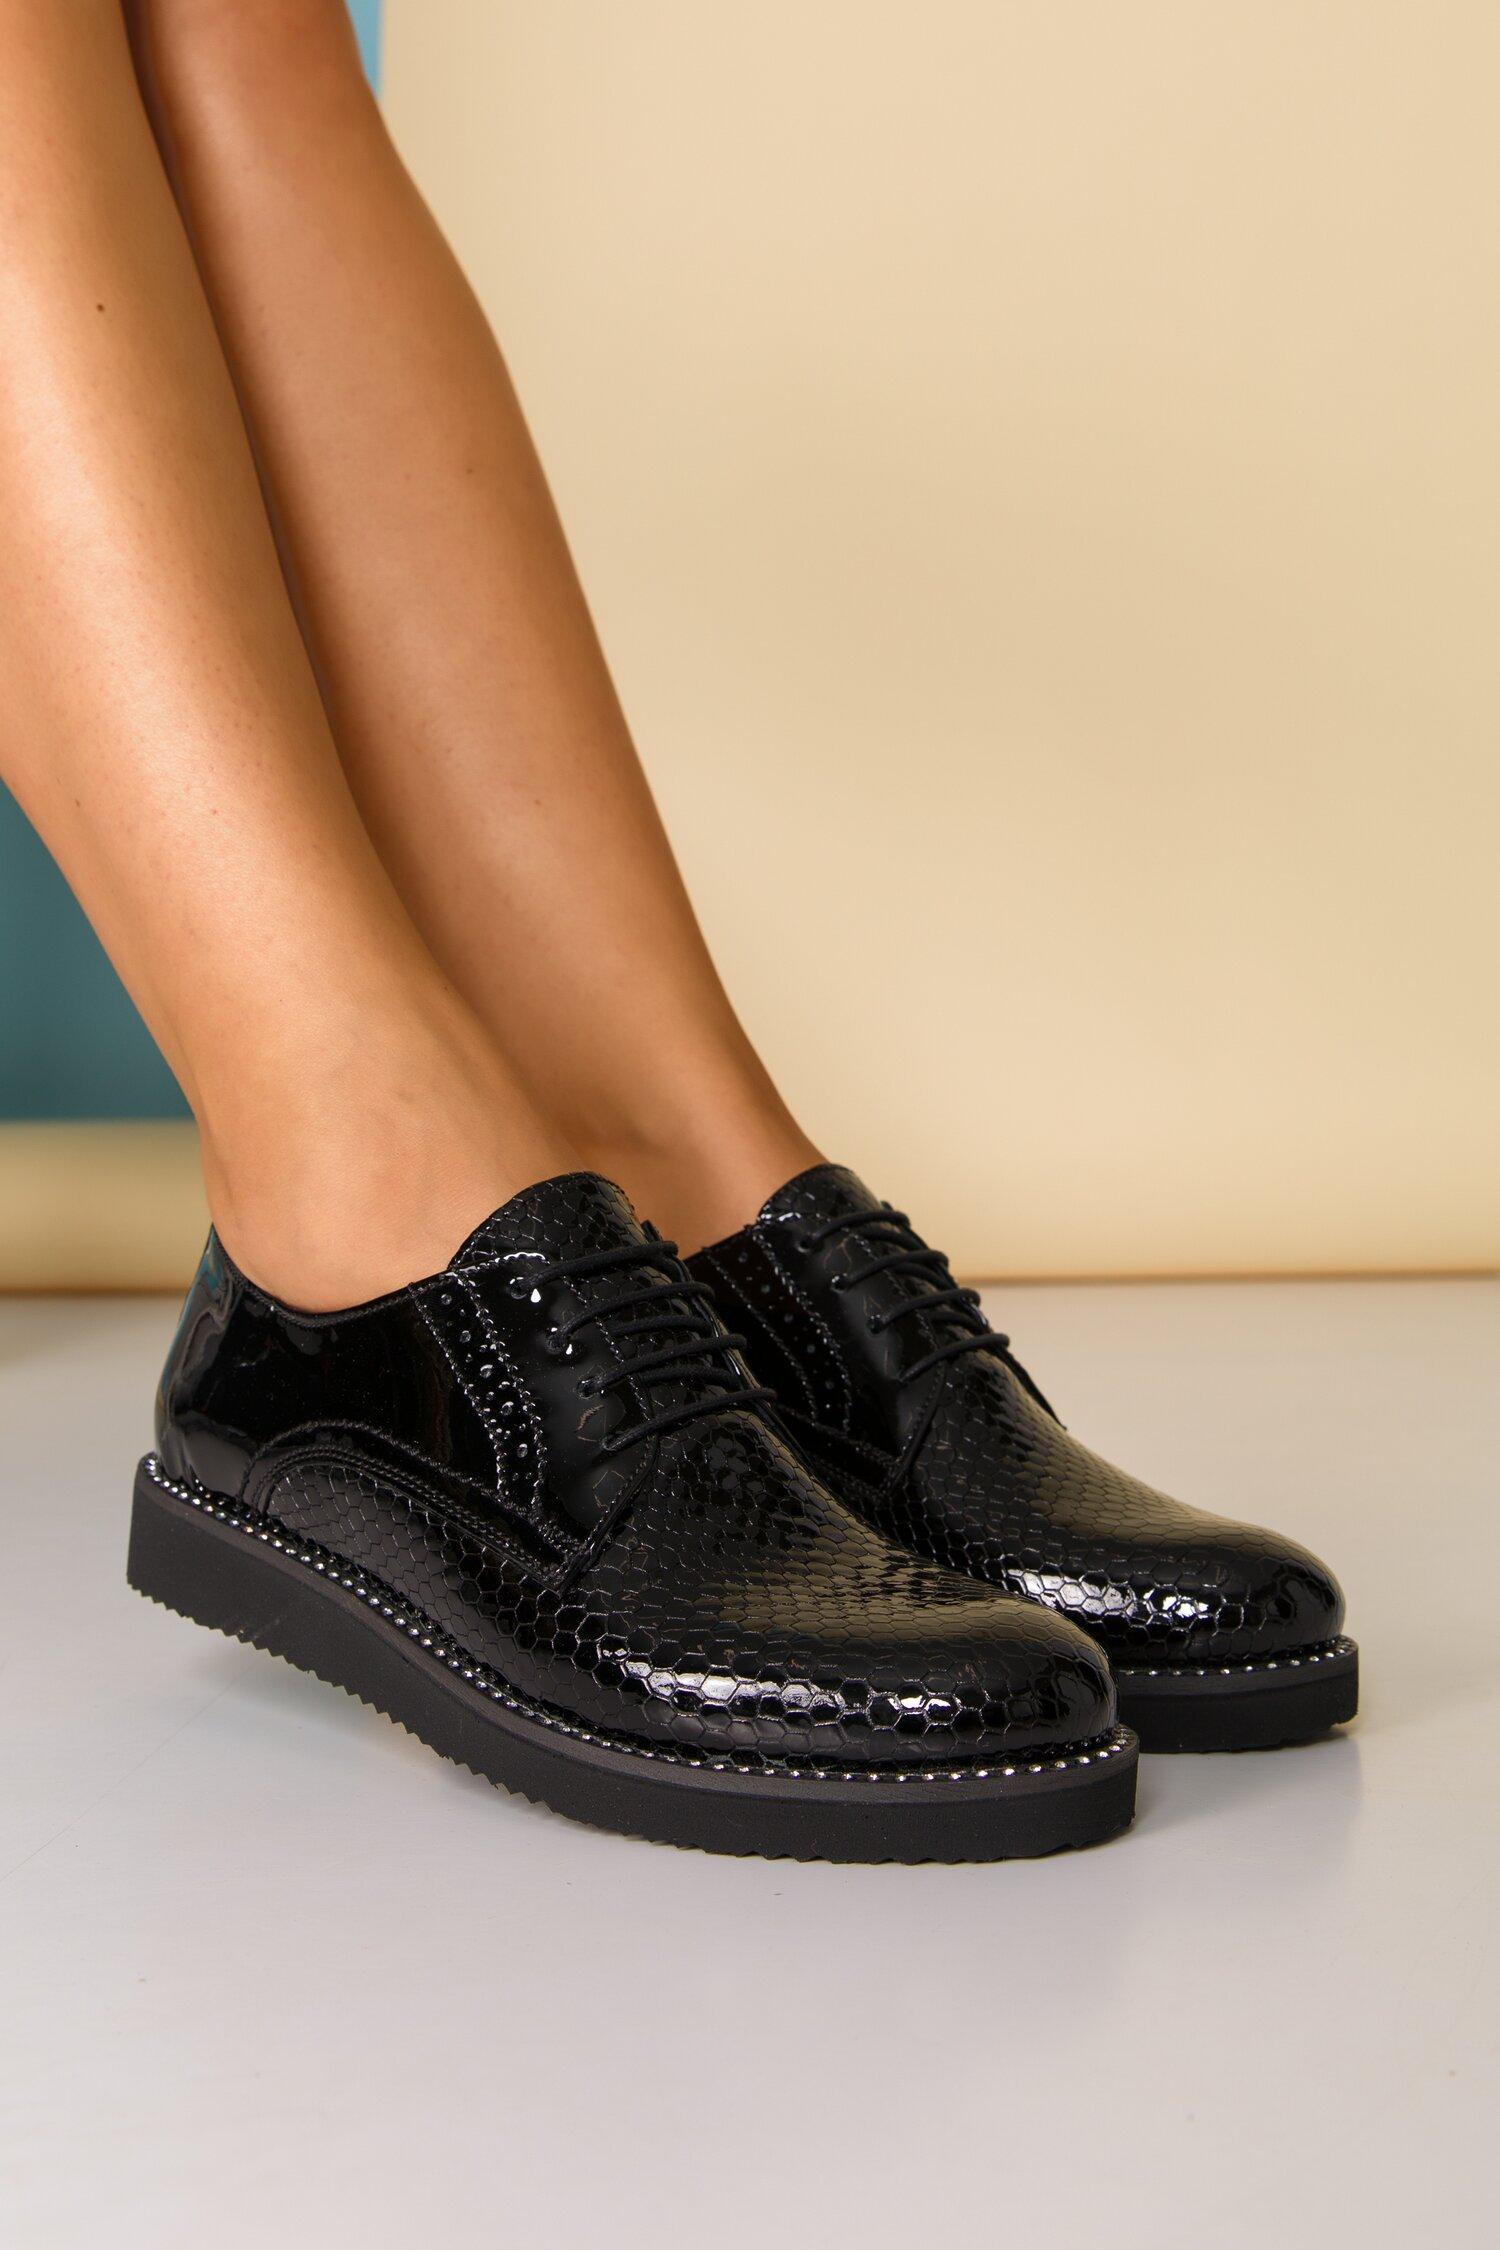 Pantofi Oxford negri cu strasuri pe talpa si inchidere cu sireturi imagine